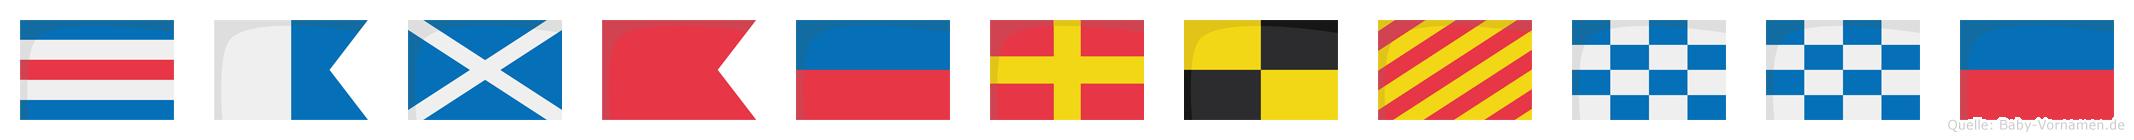 Camberlynne im Flaggenalphabet